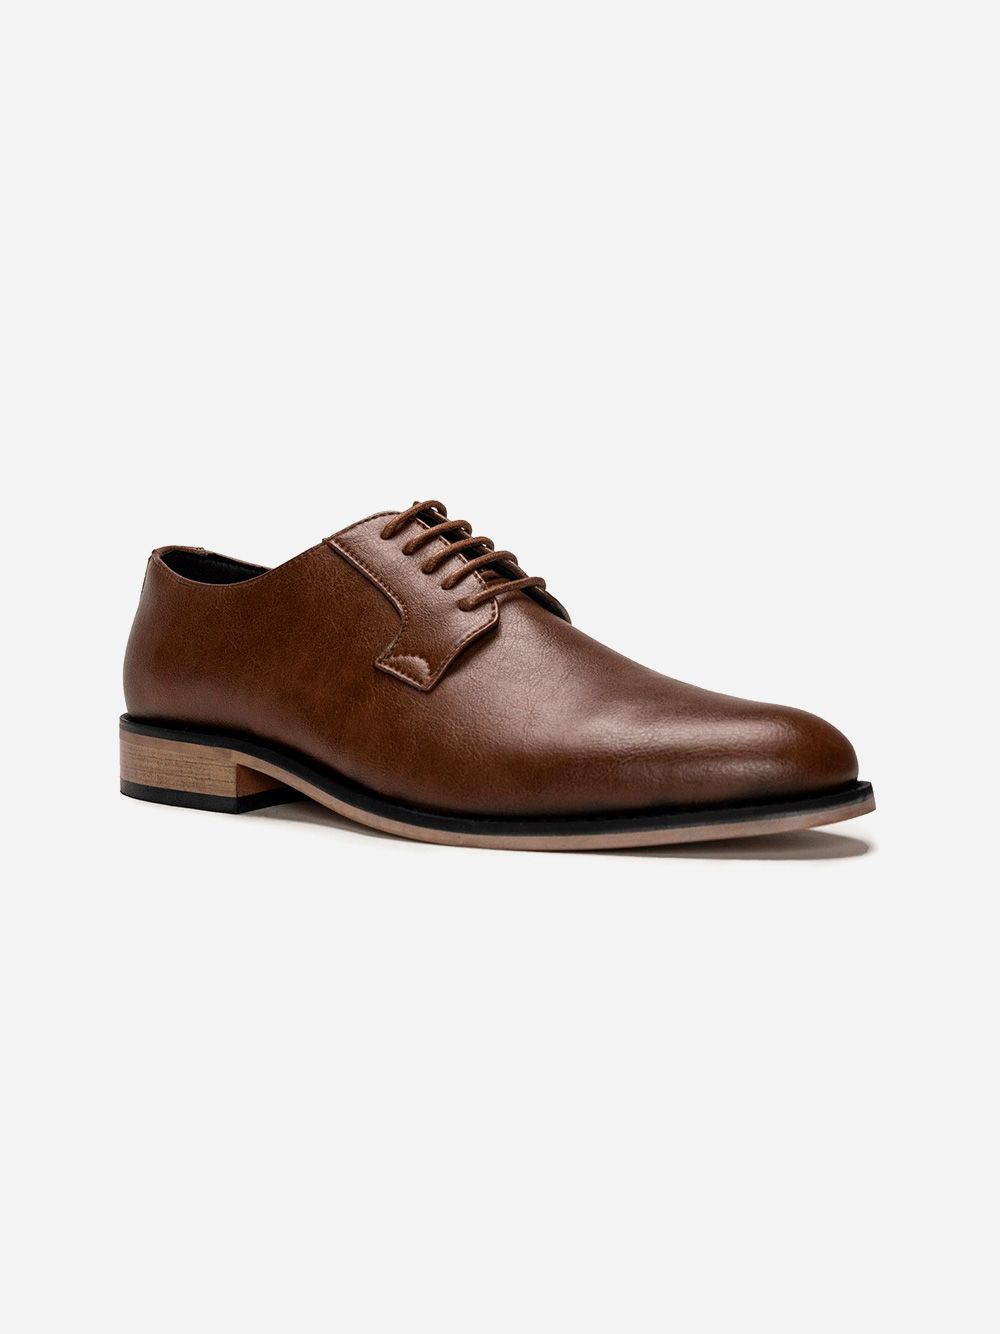 Sapato Clássico Castanho Jake   Nae